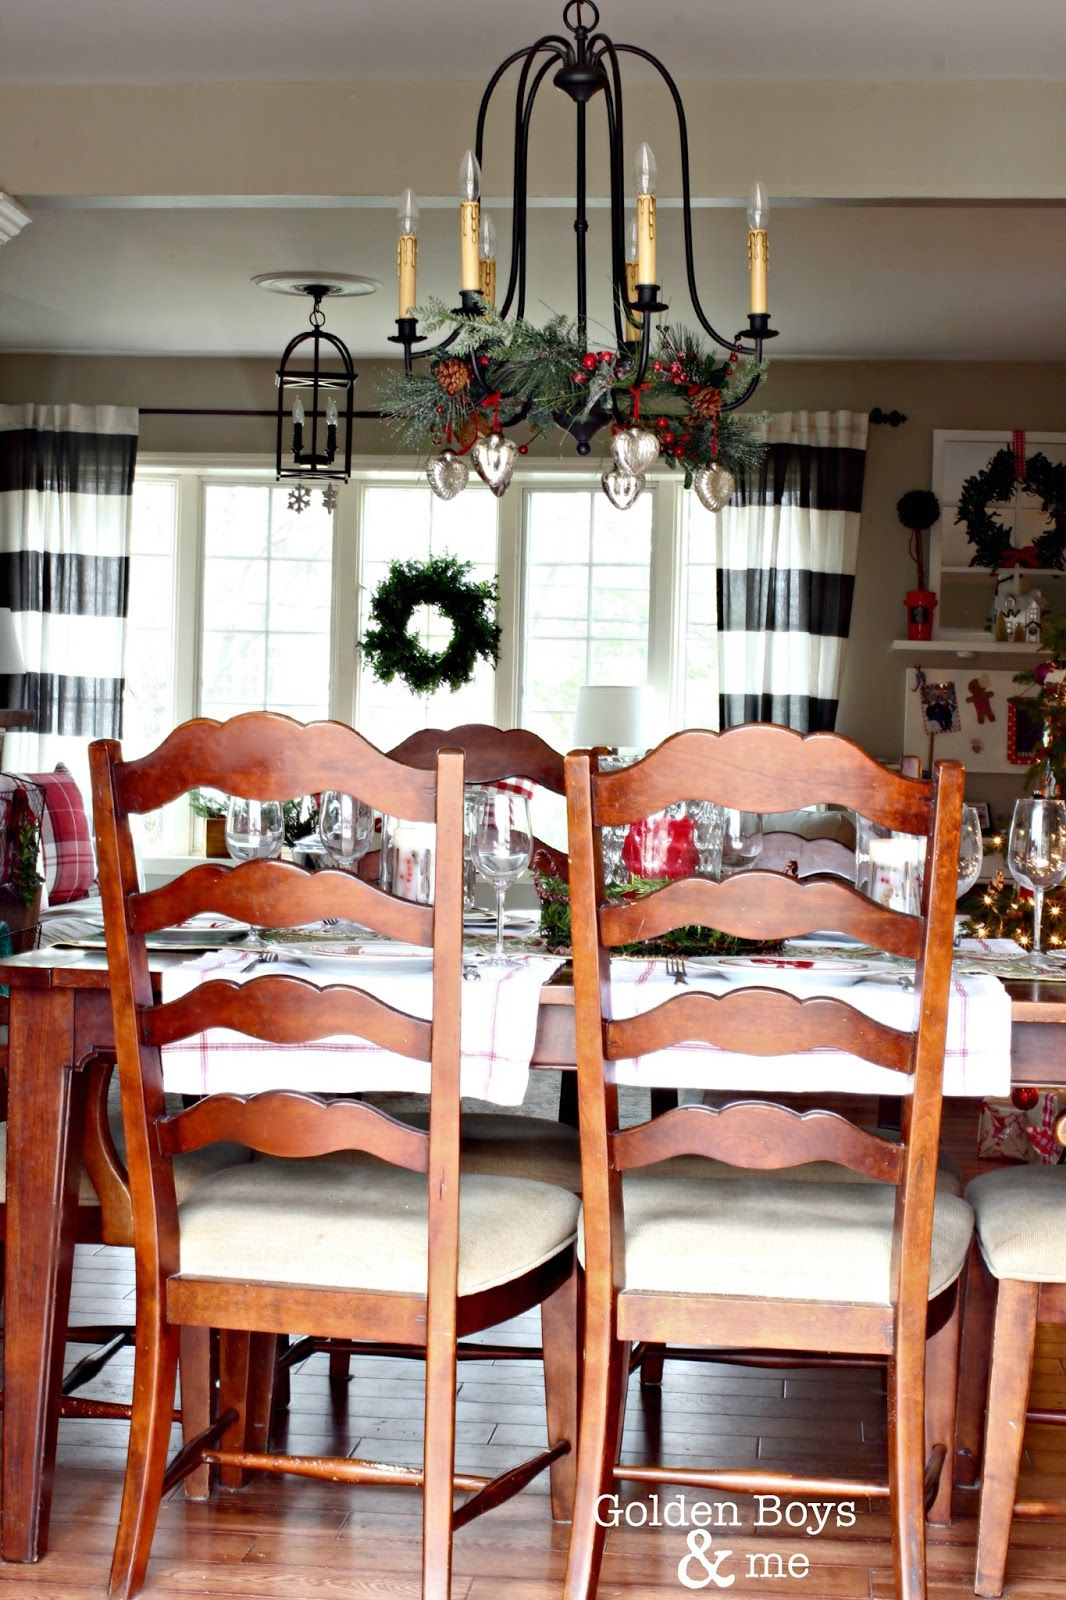 World Imports Brondy chandelier with mercury glass ornaments-www.goldenboysandme.com